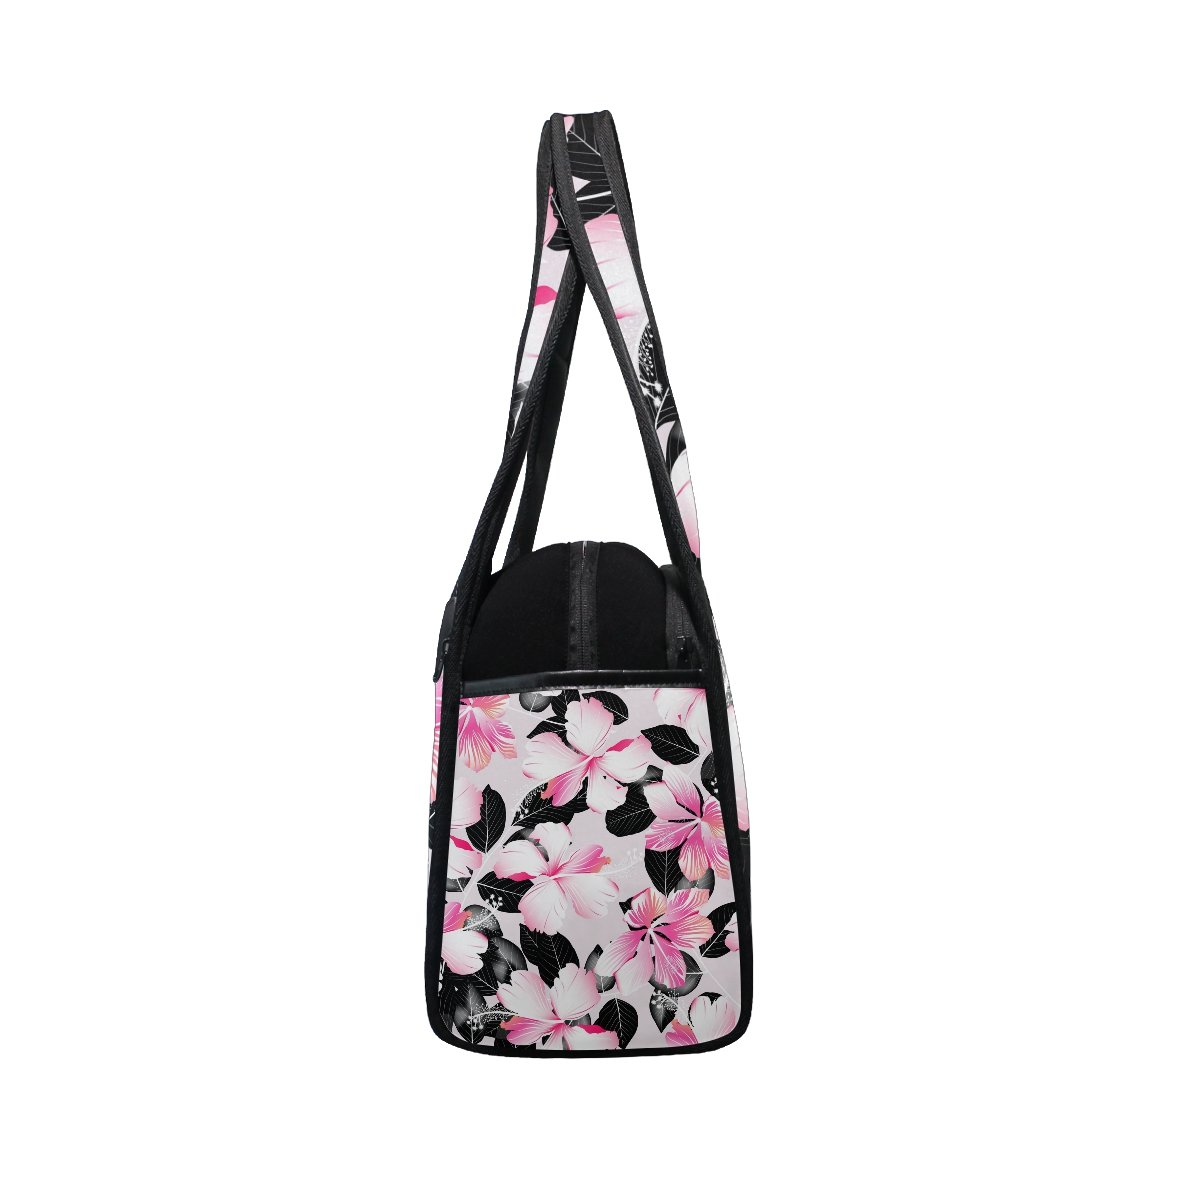 AHOMY Canvas Sports Gym Bag Tropical Flower Travel Shoulder Bag